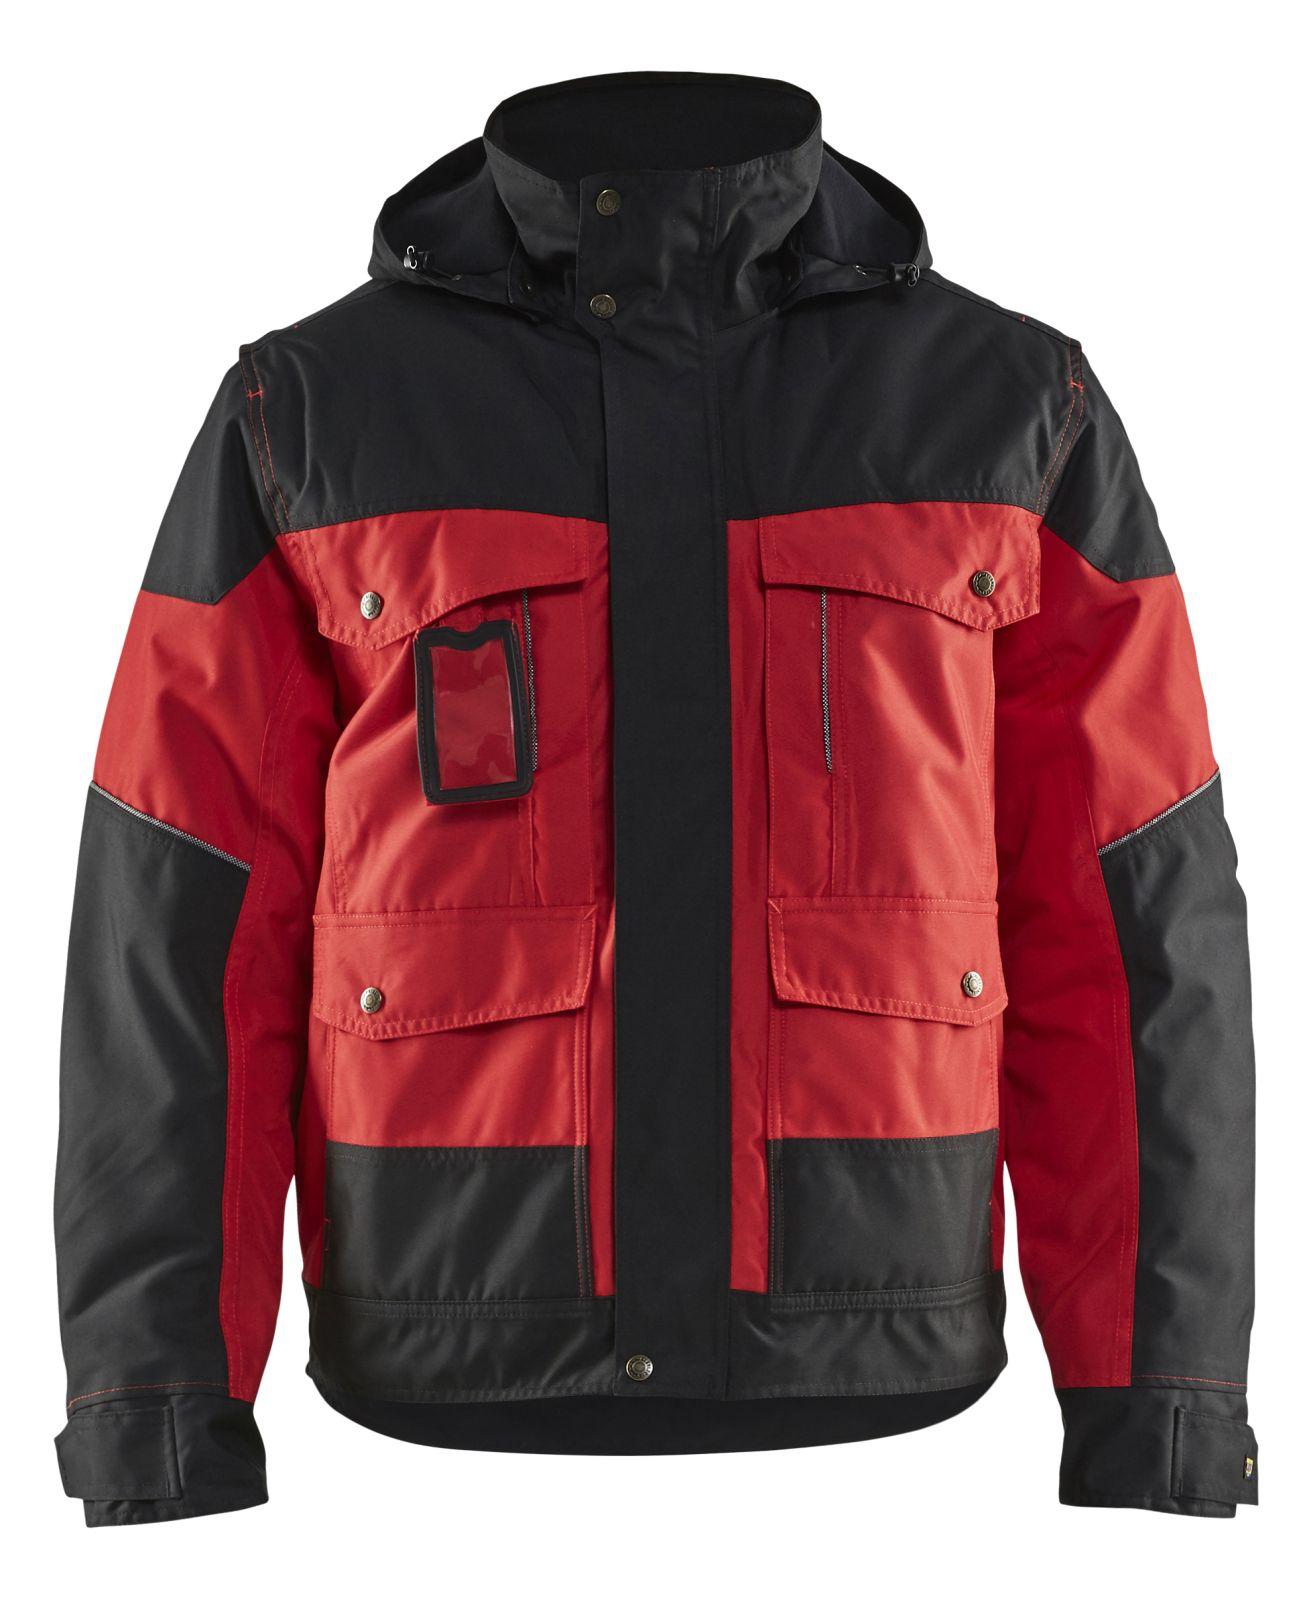 Blaklader Winterjassen 48861977 rood-zwart(5699)